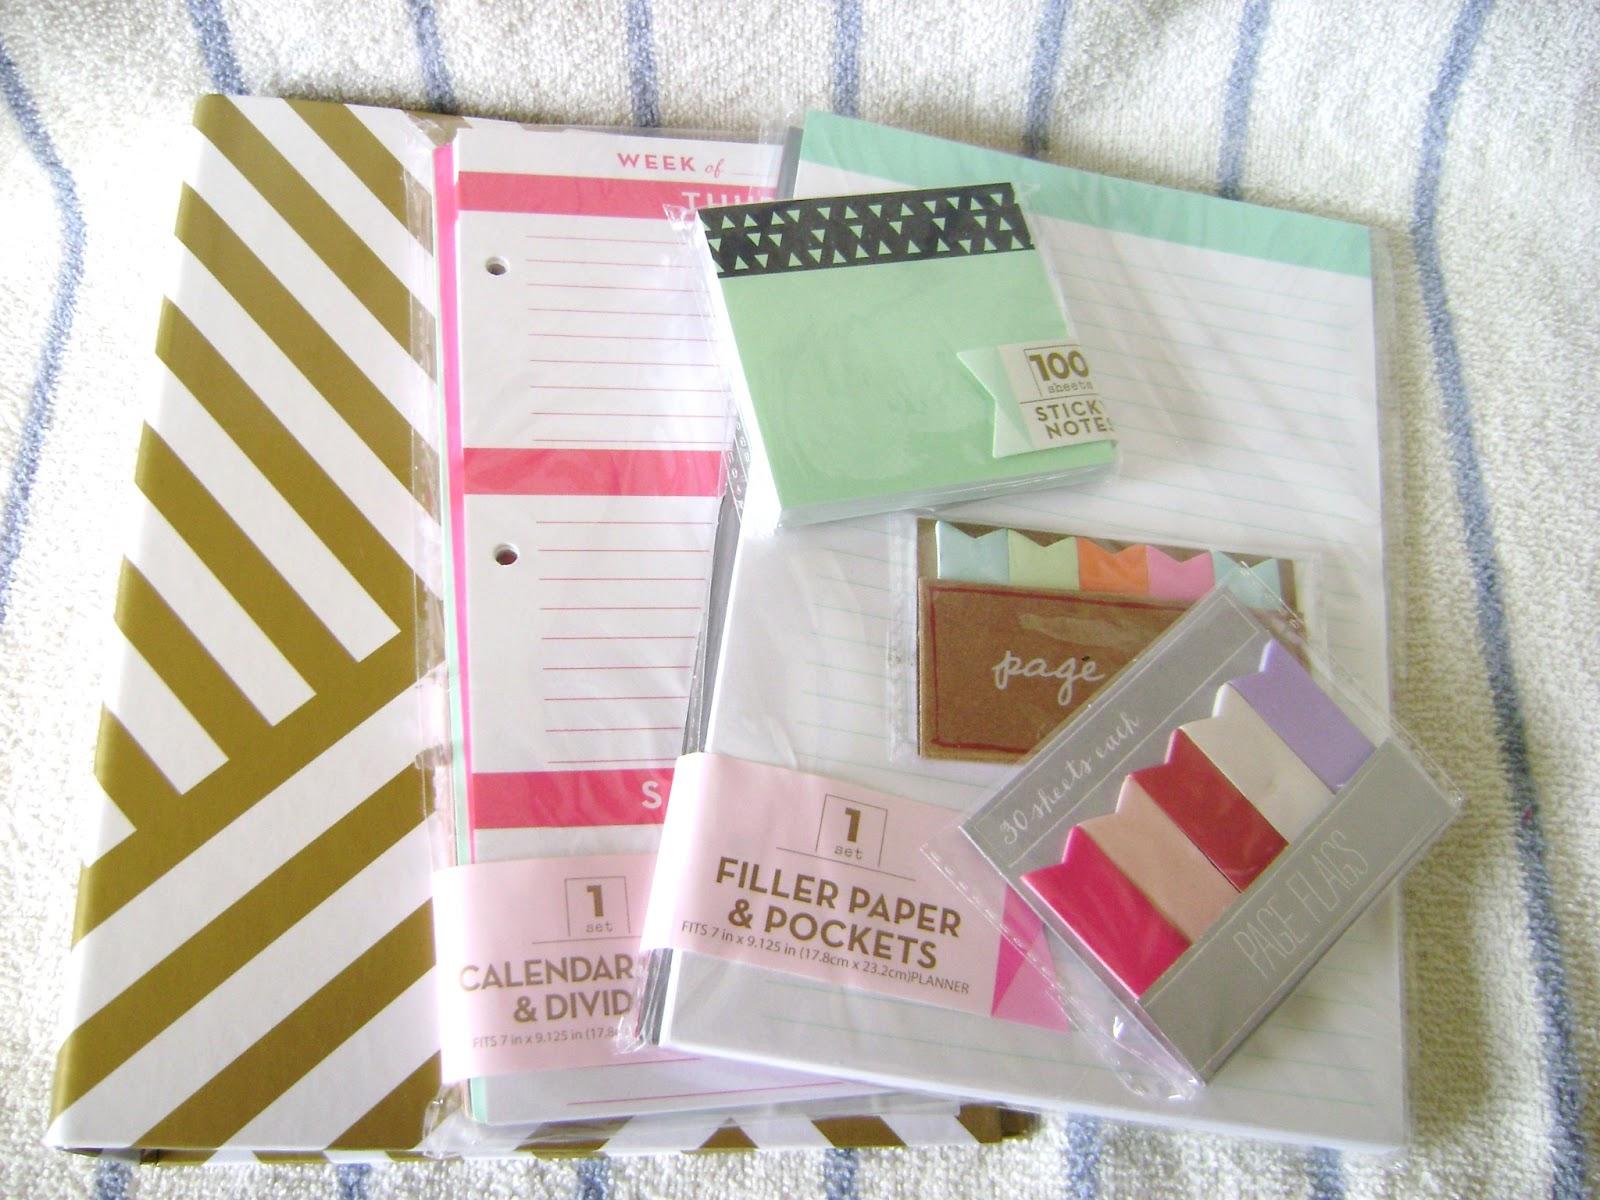 Calendar Planner Target : Its always something . . .: giveaway target dollar spot planner